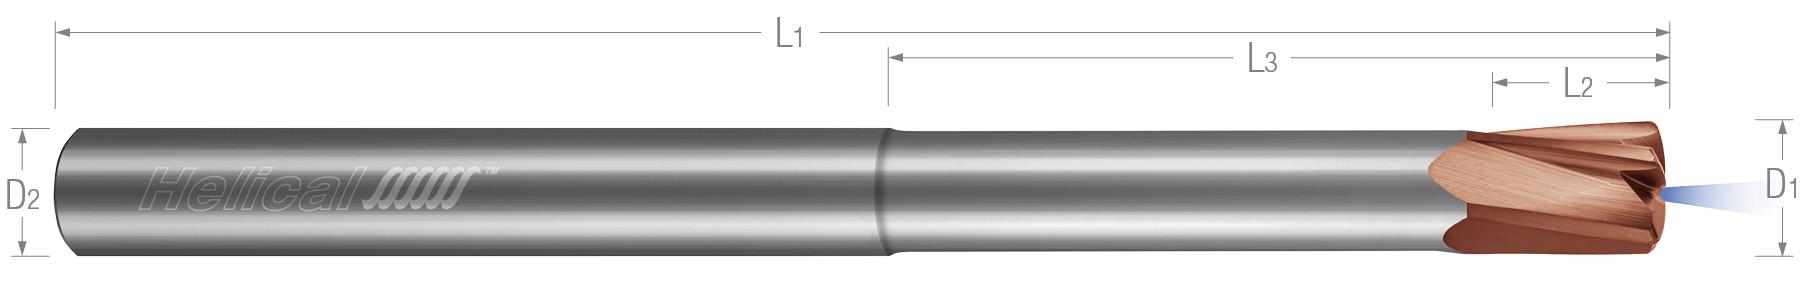 tool-details-82696